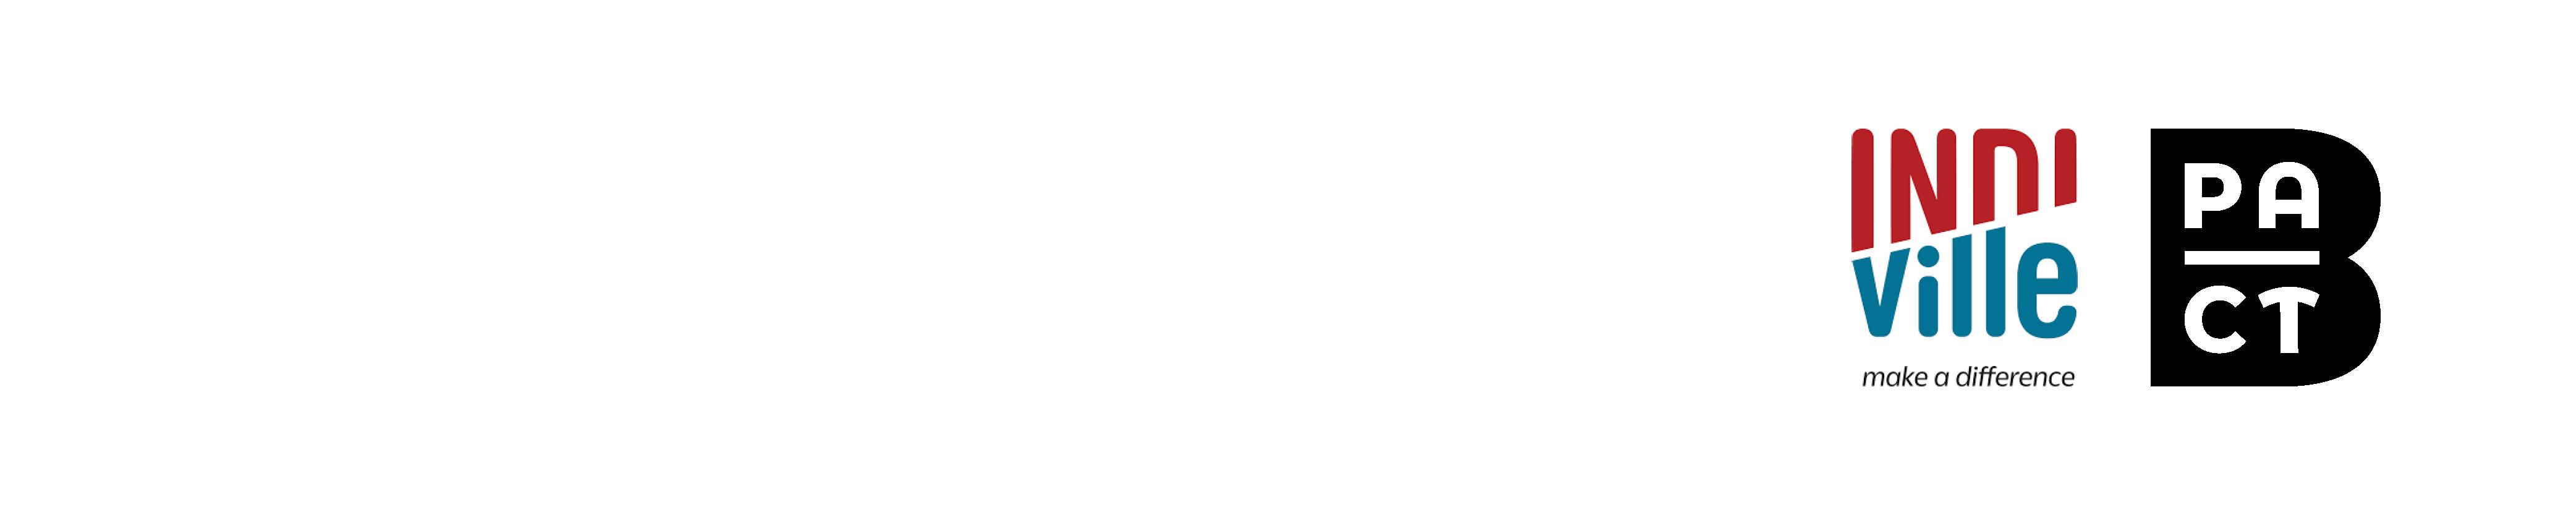 Banner Indiville Bpact